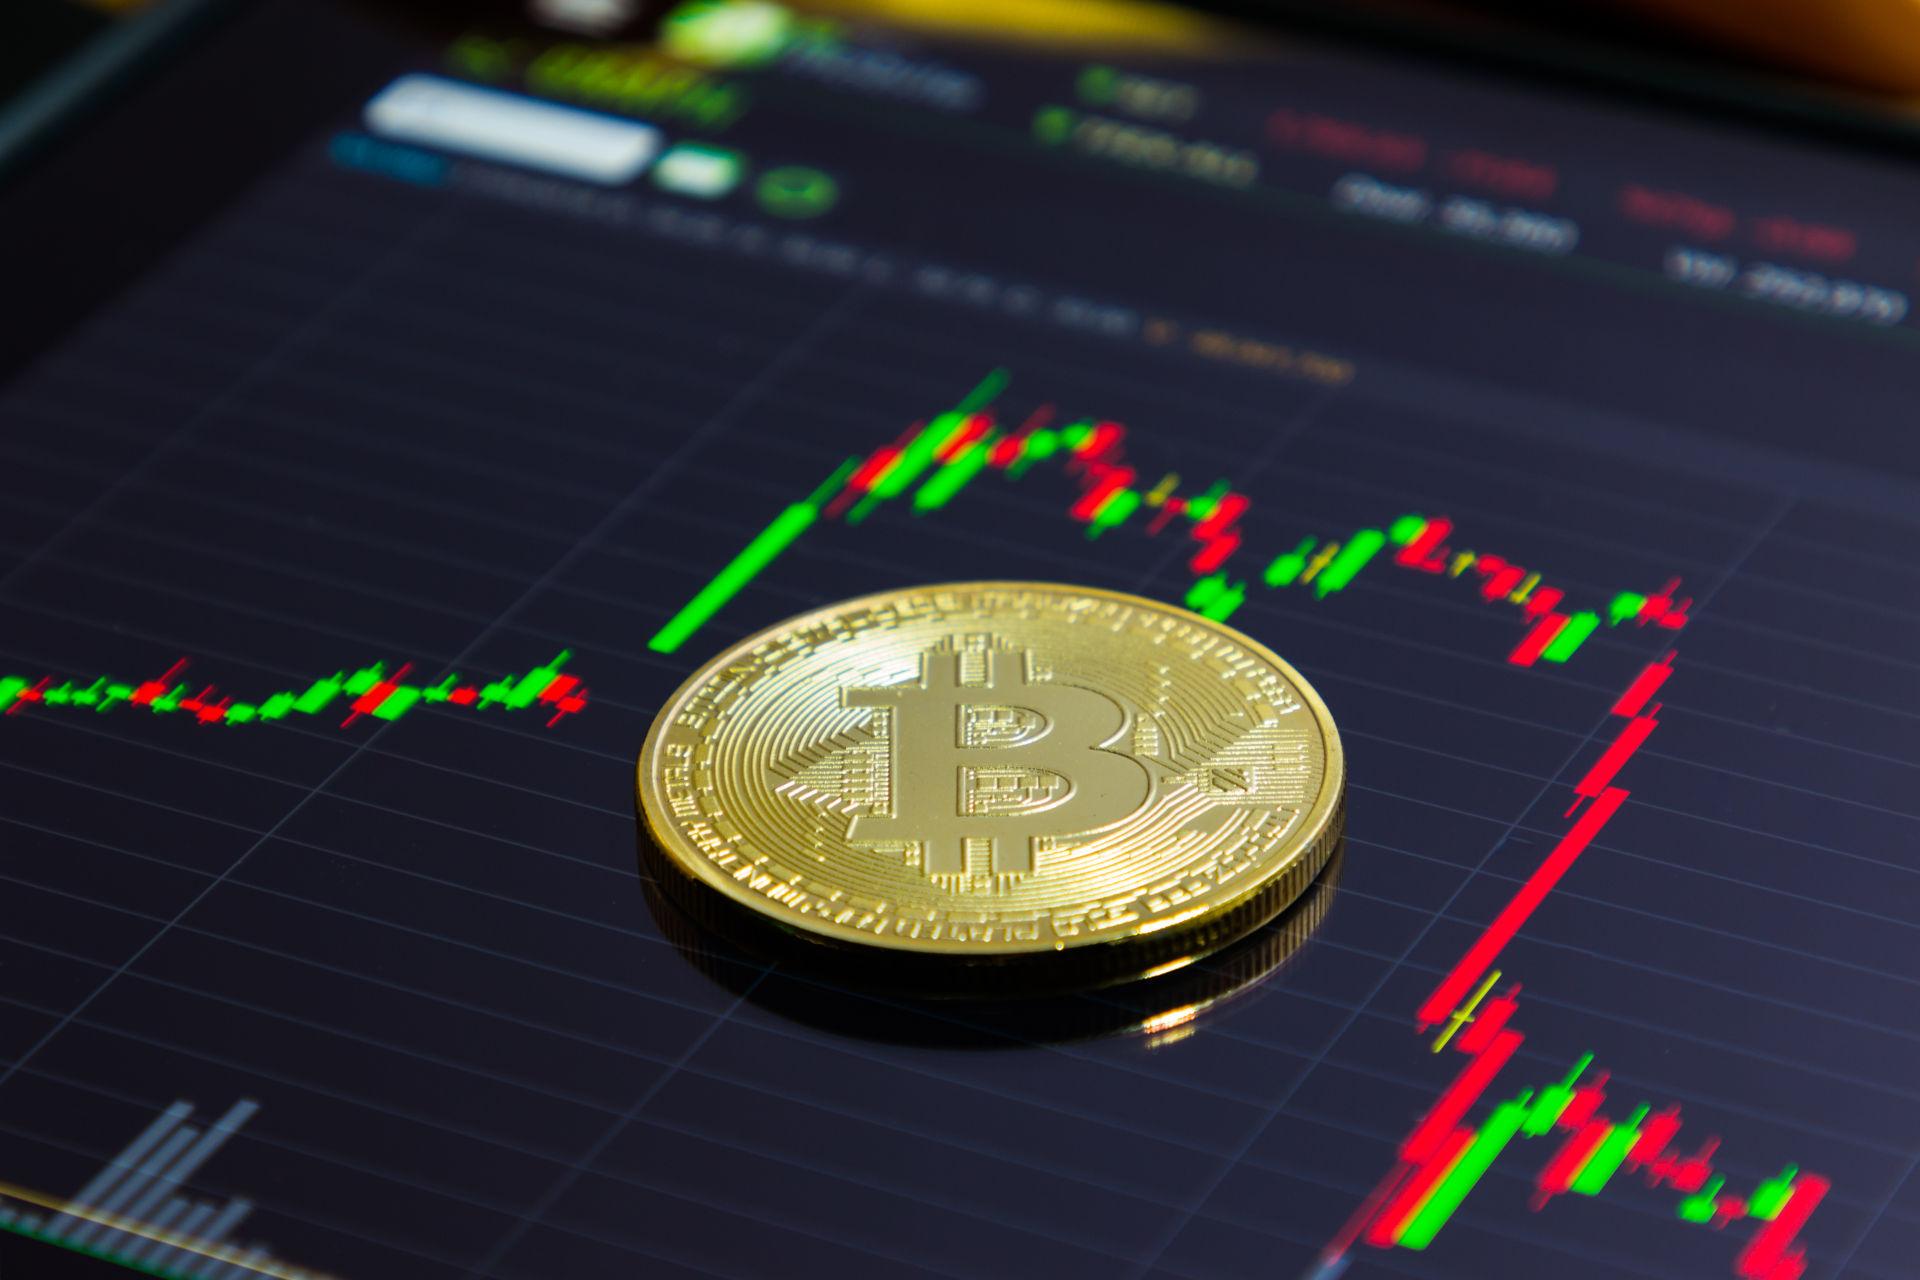 kurs bitcoina idzie na rekord dzięki tesli i tweetowi elona muska